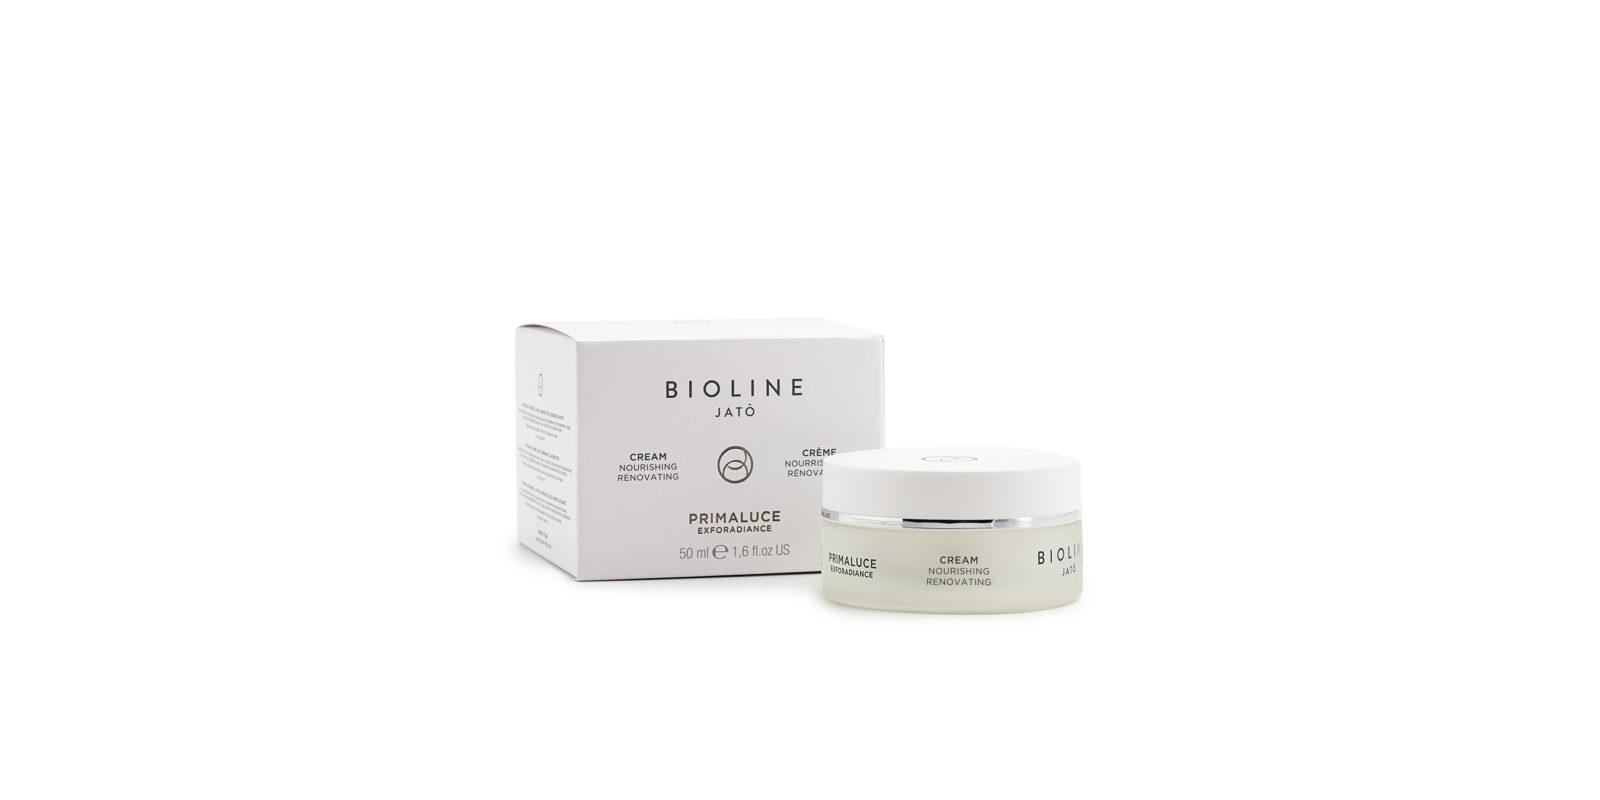 Bioline Jatò Primaluce Exforadiance Crema